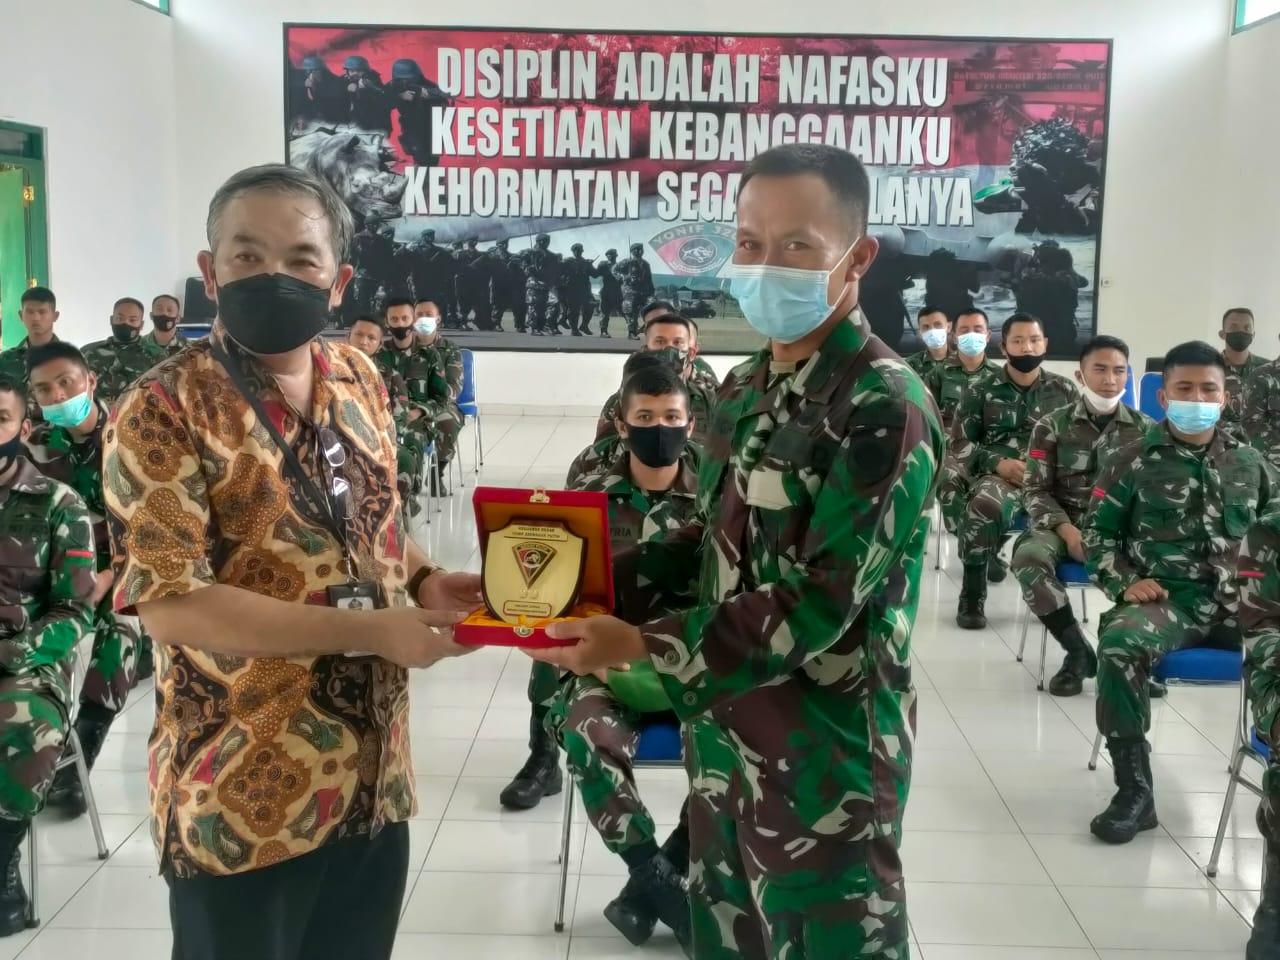 Danrem Brigjen TNI Gumuruh Winardjatmiko saat memberikan cenderamata kepada Pakar Komunikasi dan Motivator Nasional Dr Aqua Dwipayana di Serang. (Foto:Dok/Tugu Jatim)